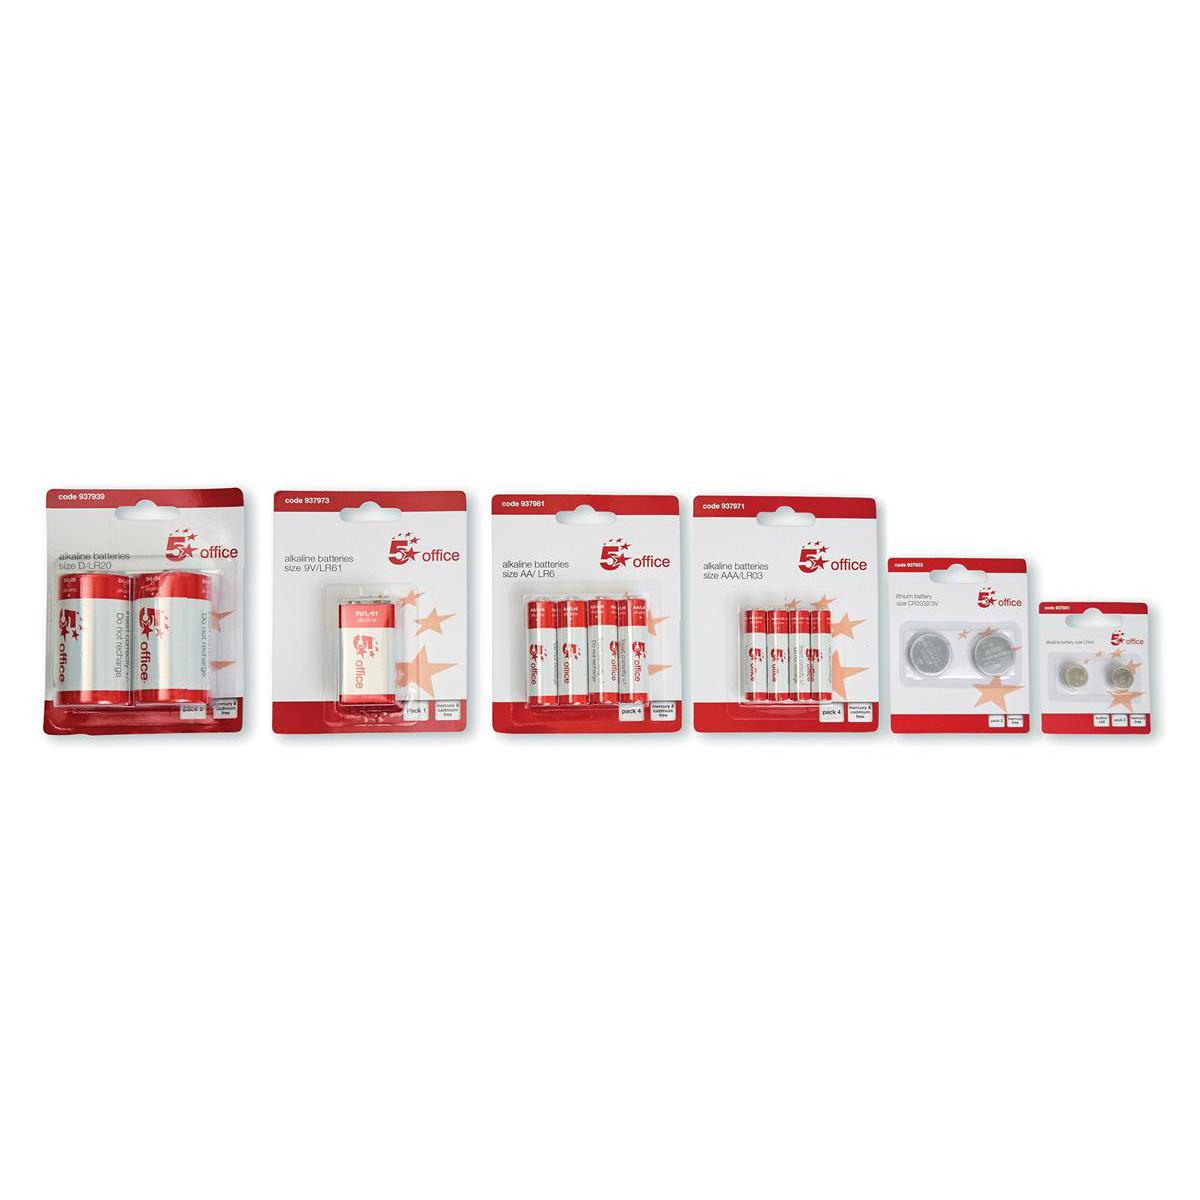 5 Star Office Batteries LR44 / 76 FSB-2 [Pack 2]